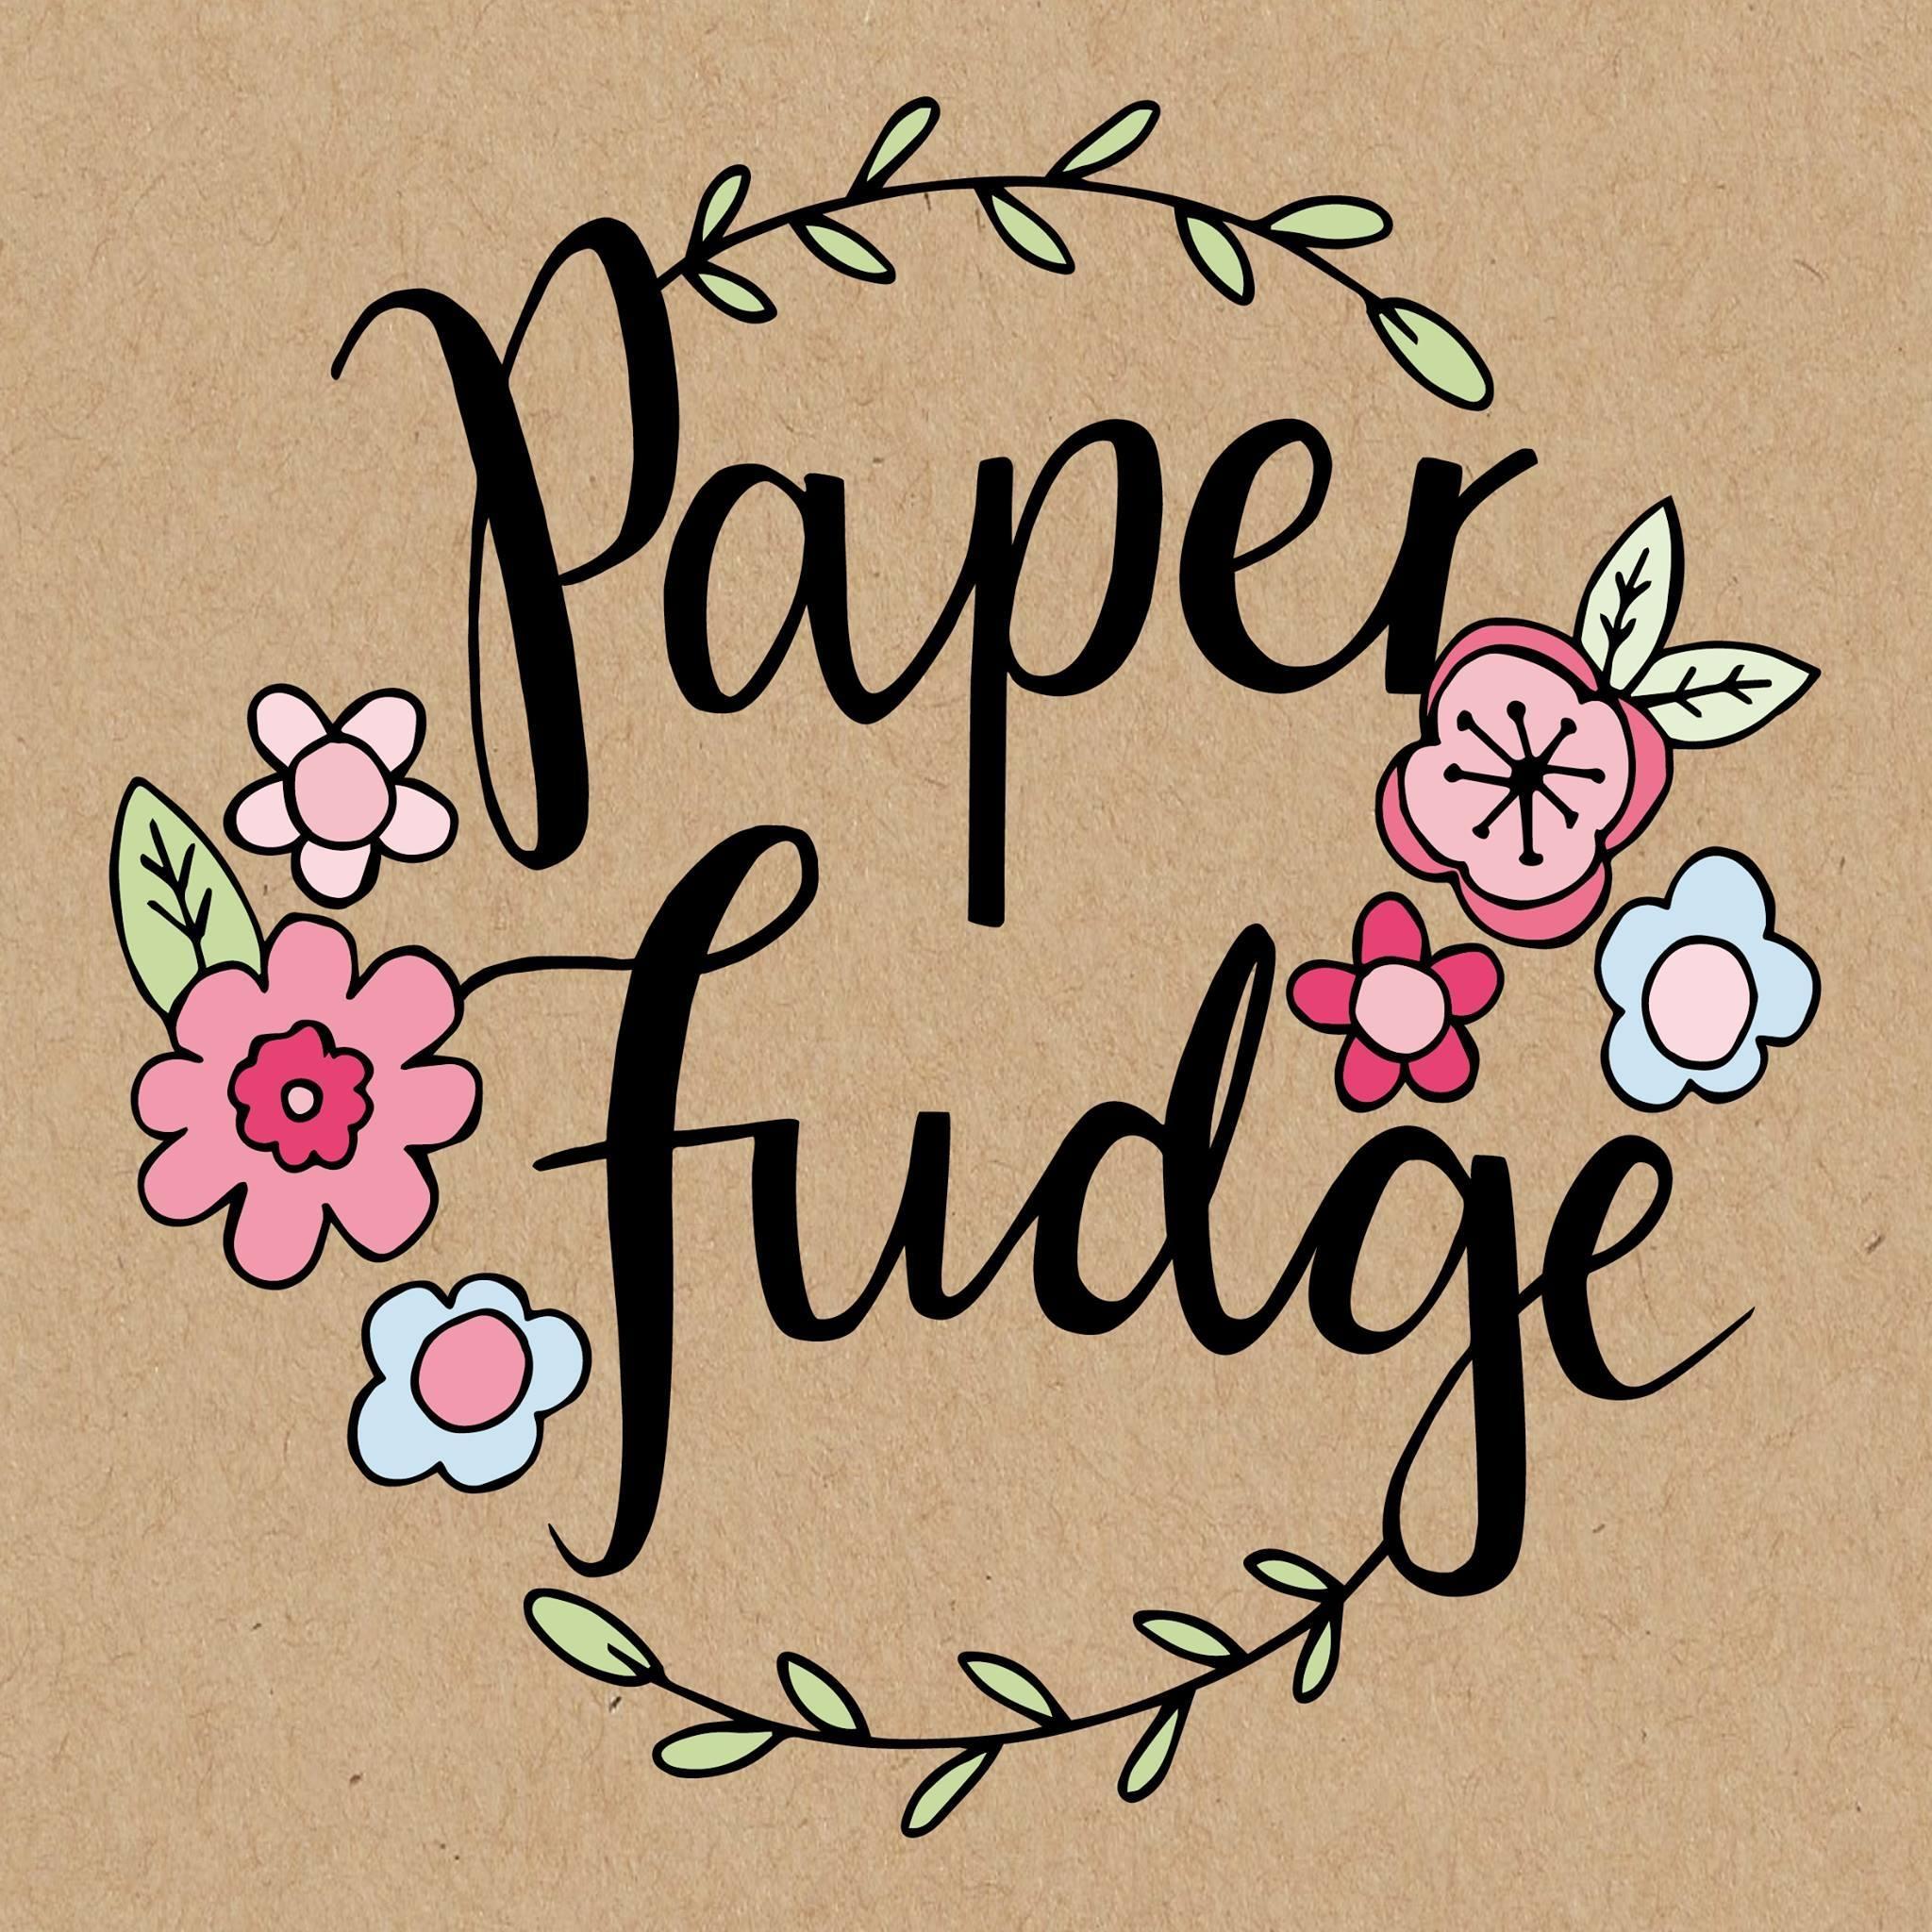 Paper Fudge  Beautiful bespoke wedding stationary